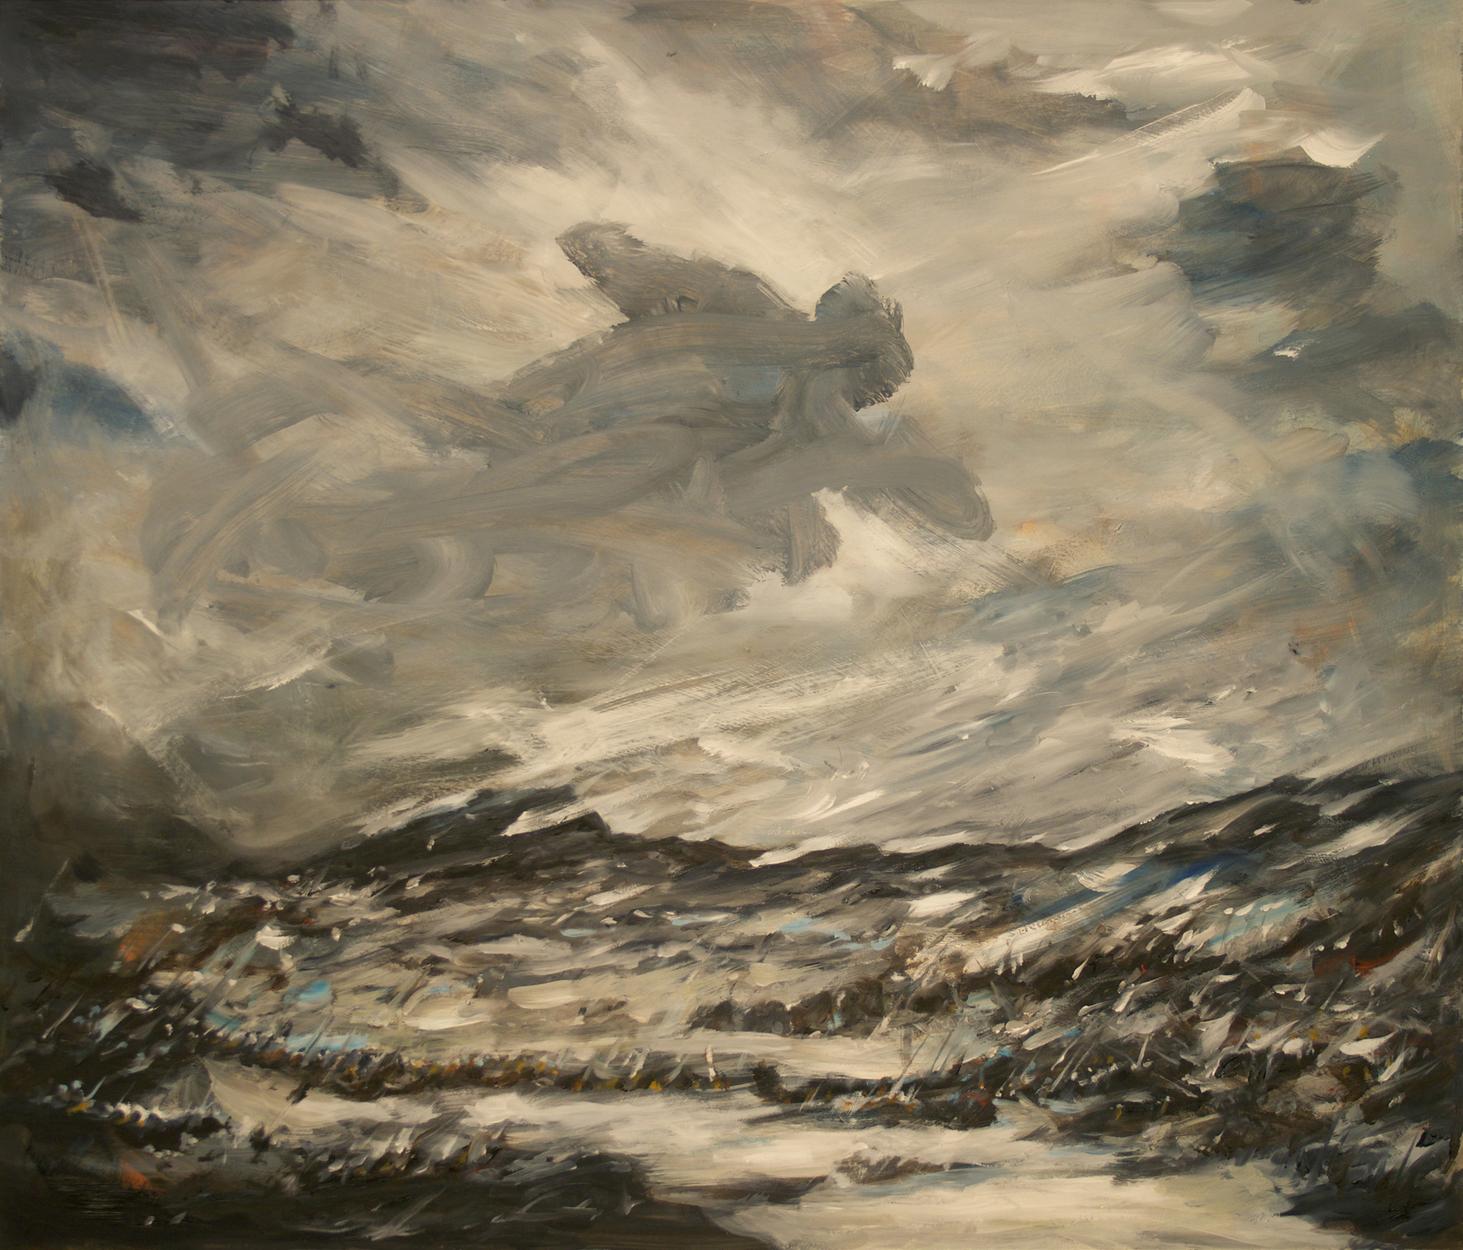 Hannibal crossing the Alps Artwork by Brian McElligott